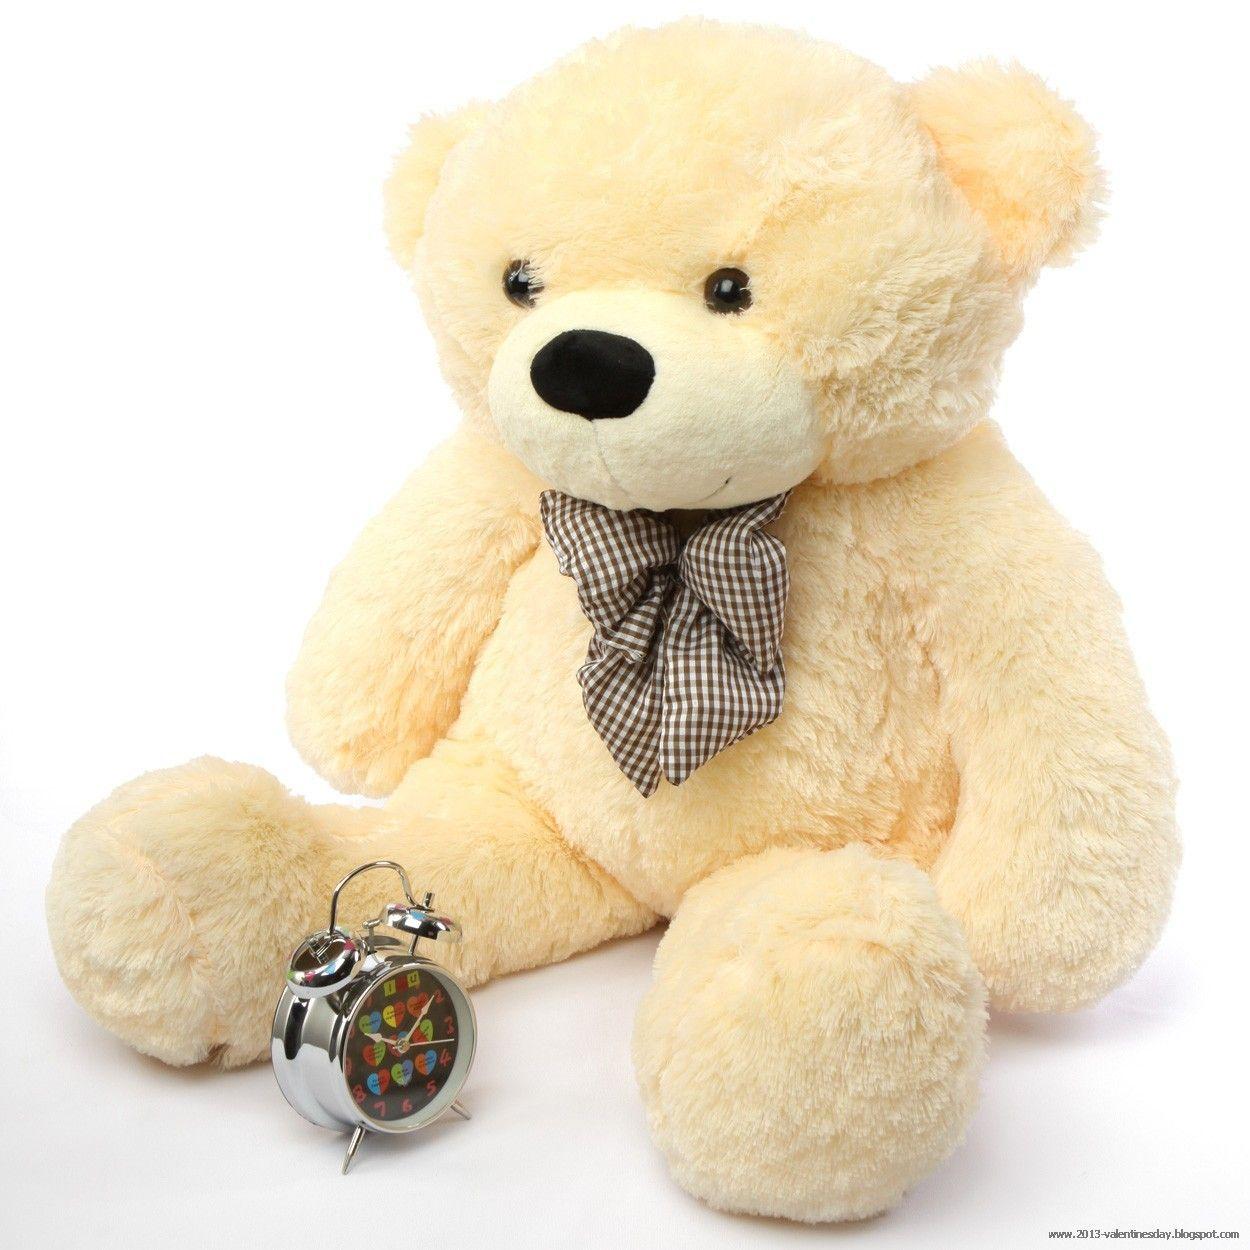 Cute Teddy Bears Cute Teddy Bear Hd Wallpaper 2014 Teddy Bears